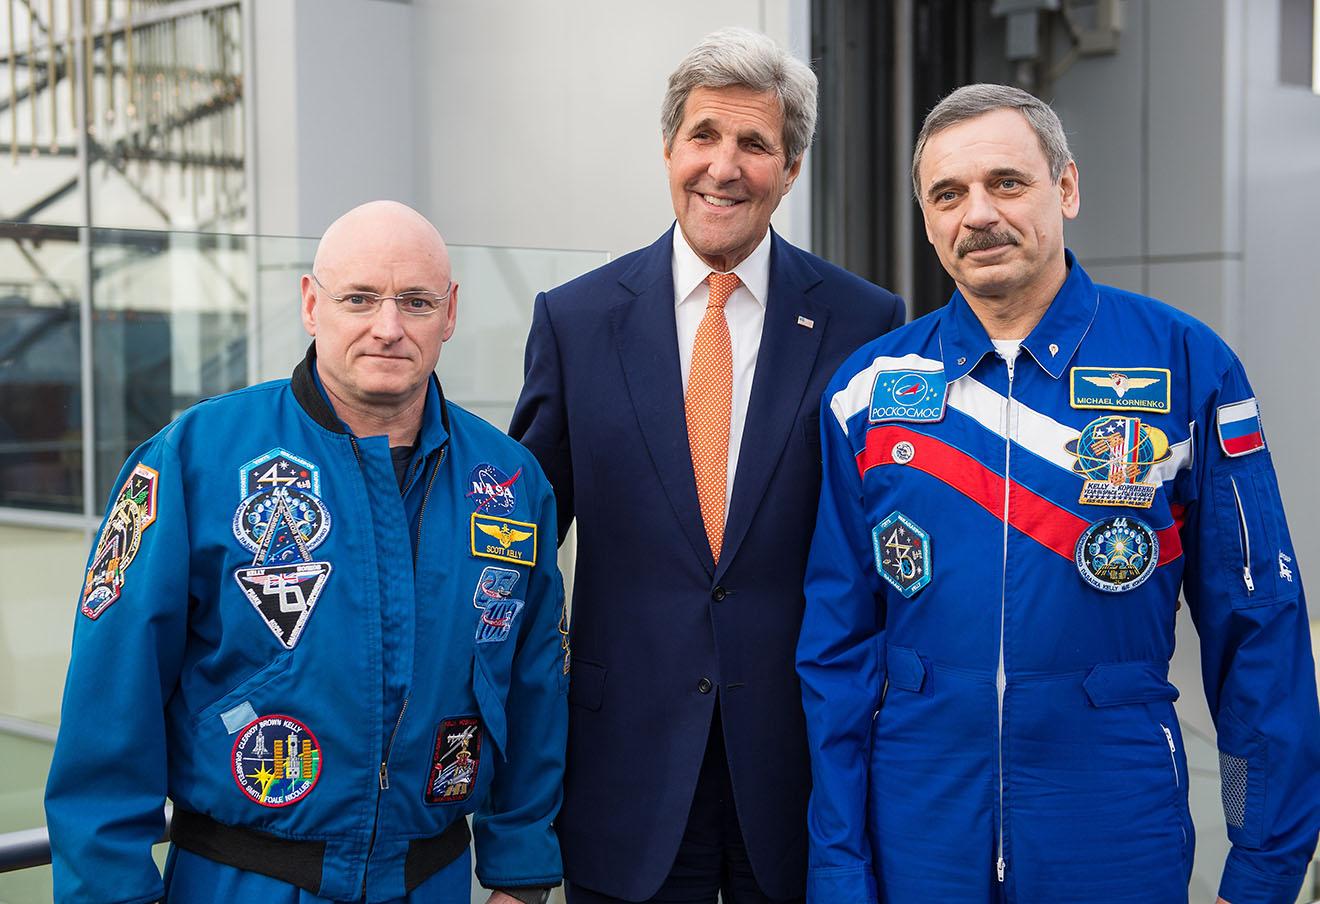 Скотт Келли, Джон Керри и Михаил Корниенко (слева направо), март 2016 года.